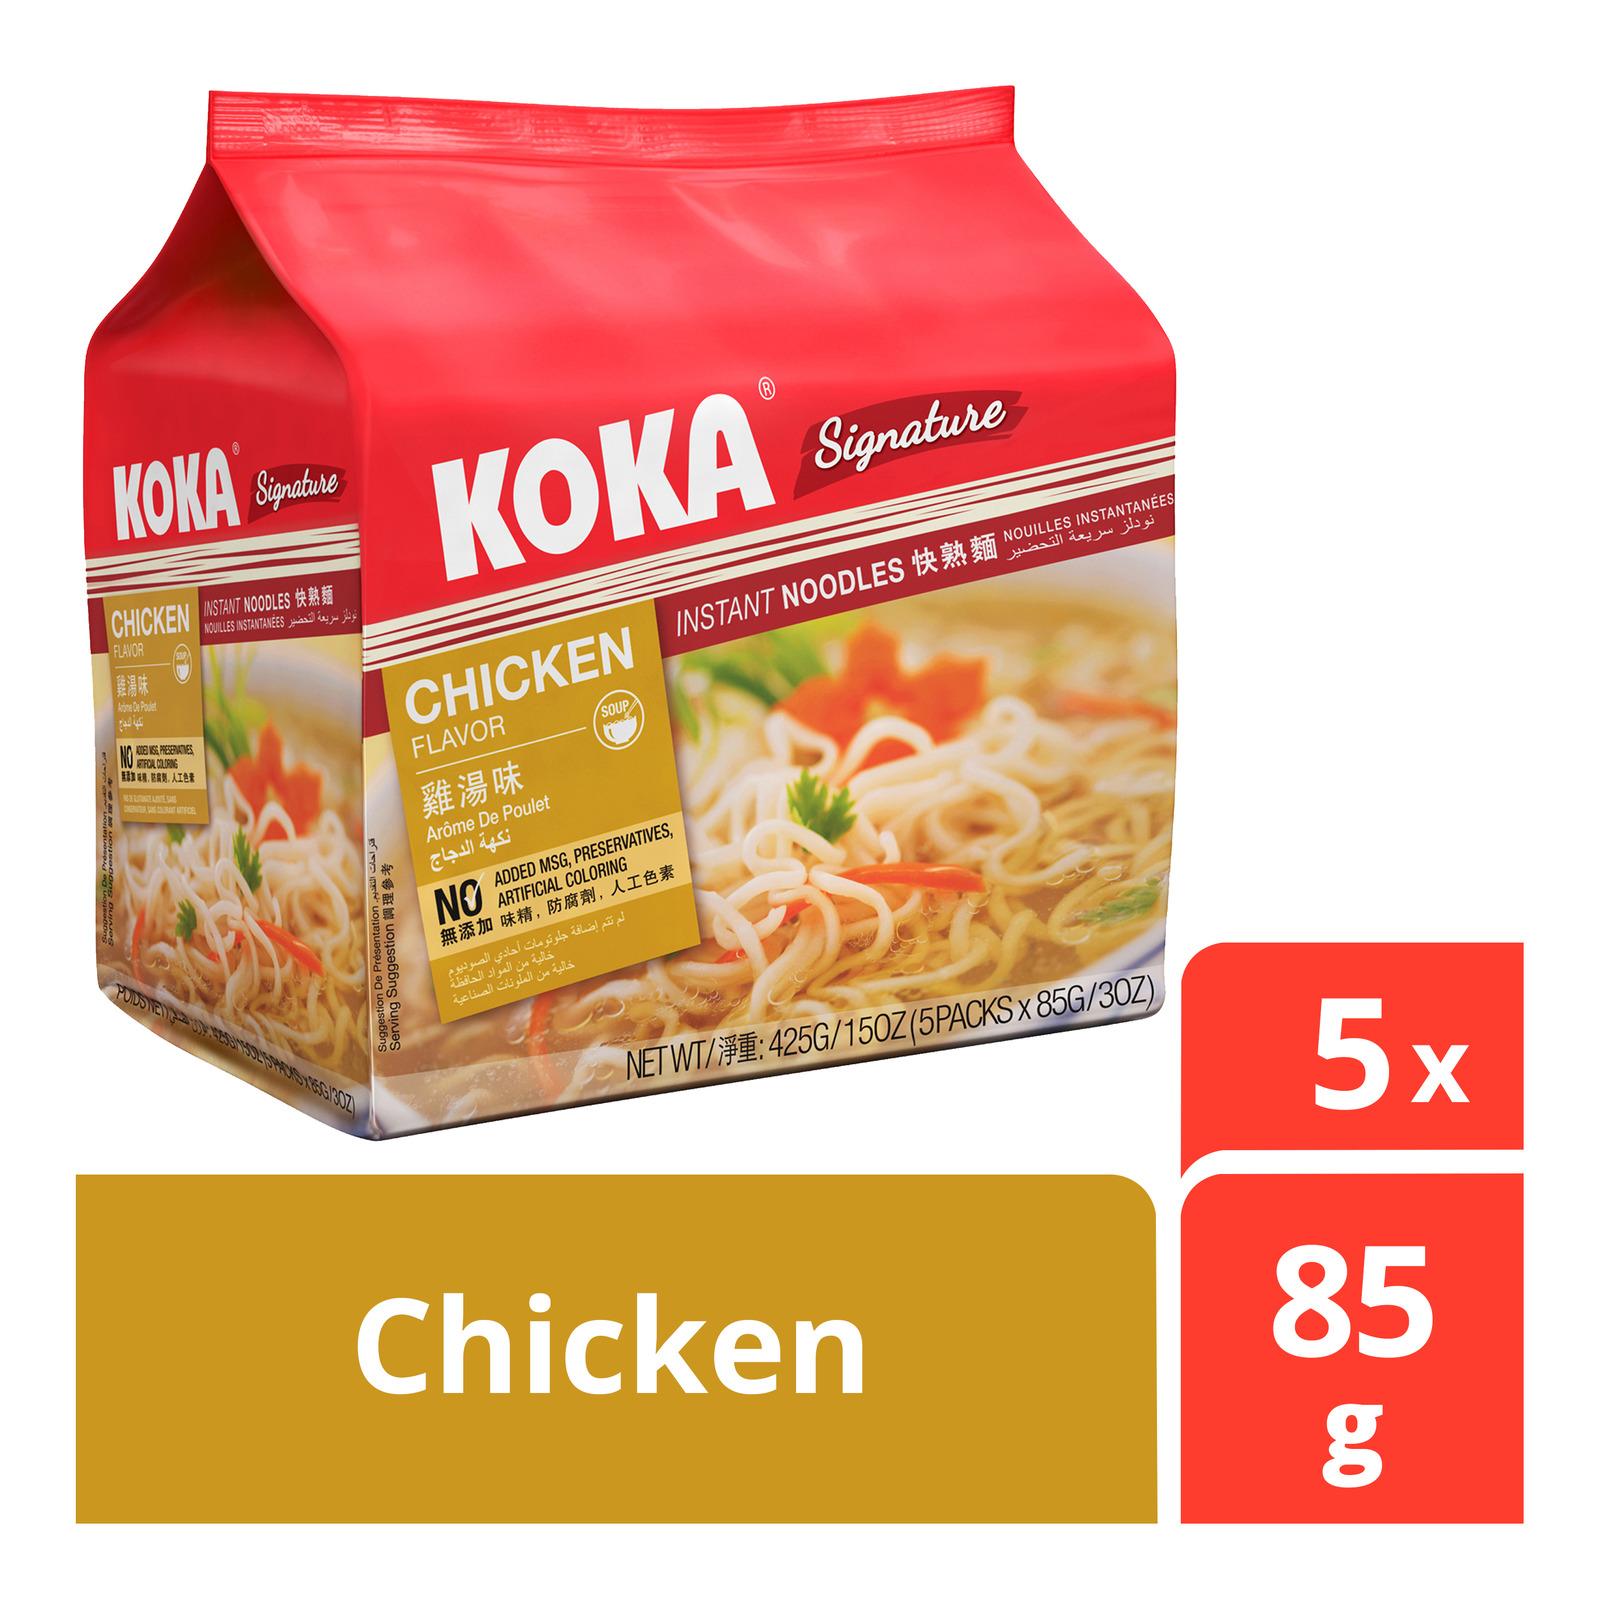 Koka Instant Noodles - Chicken